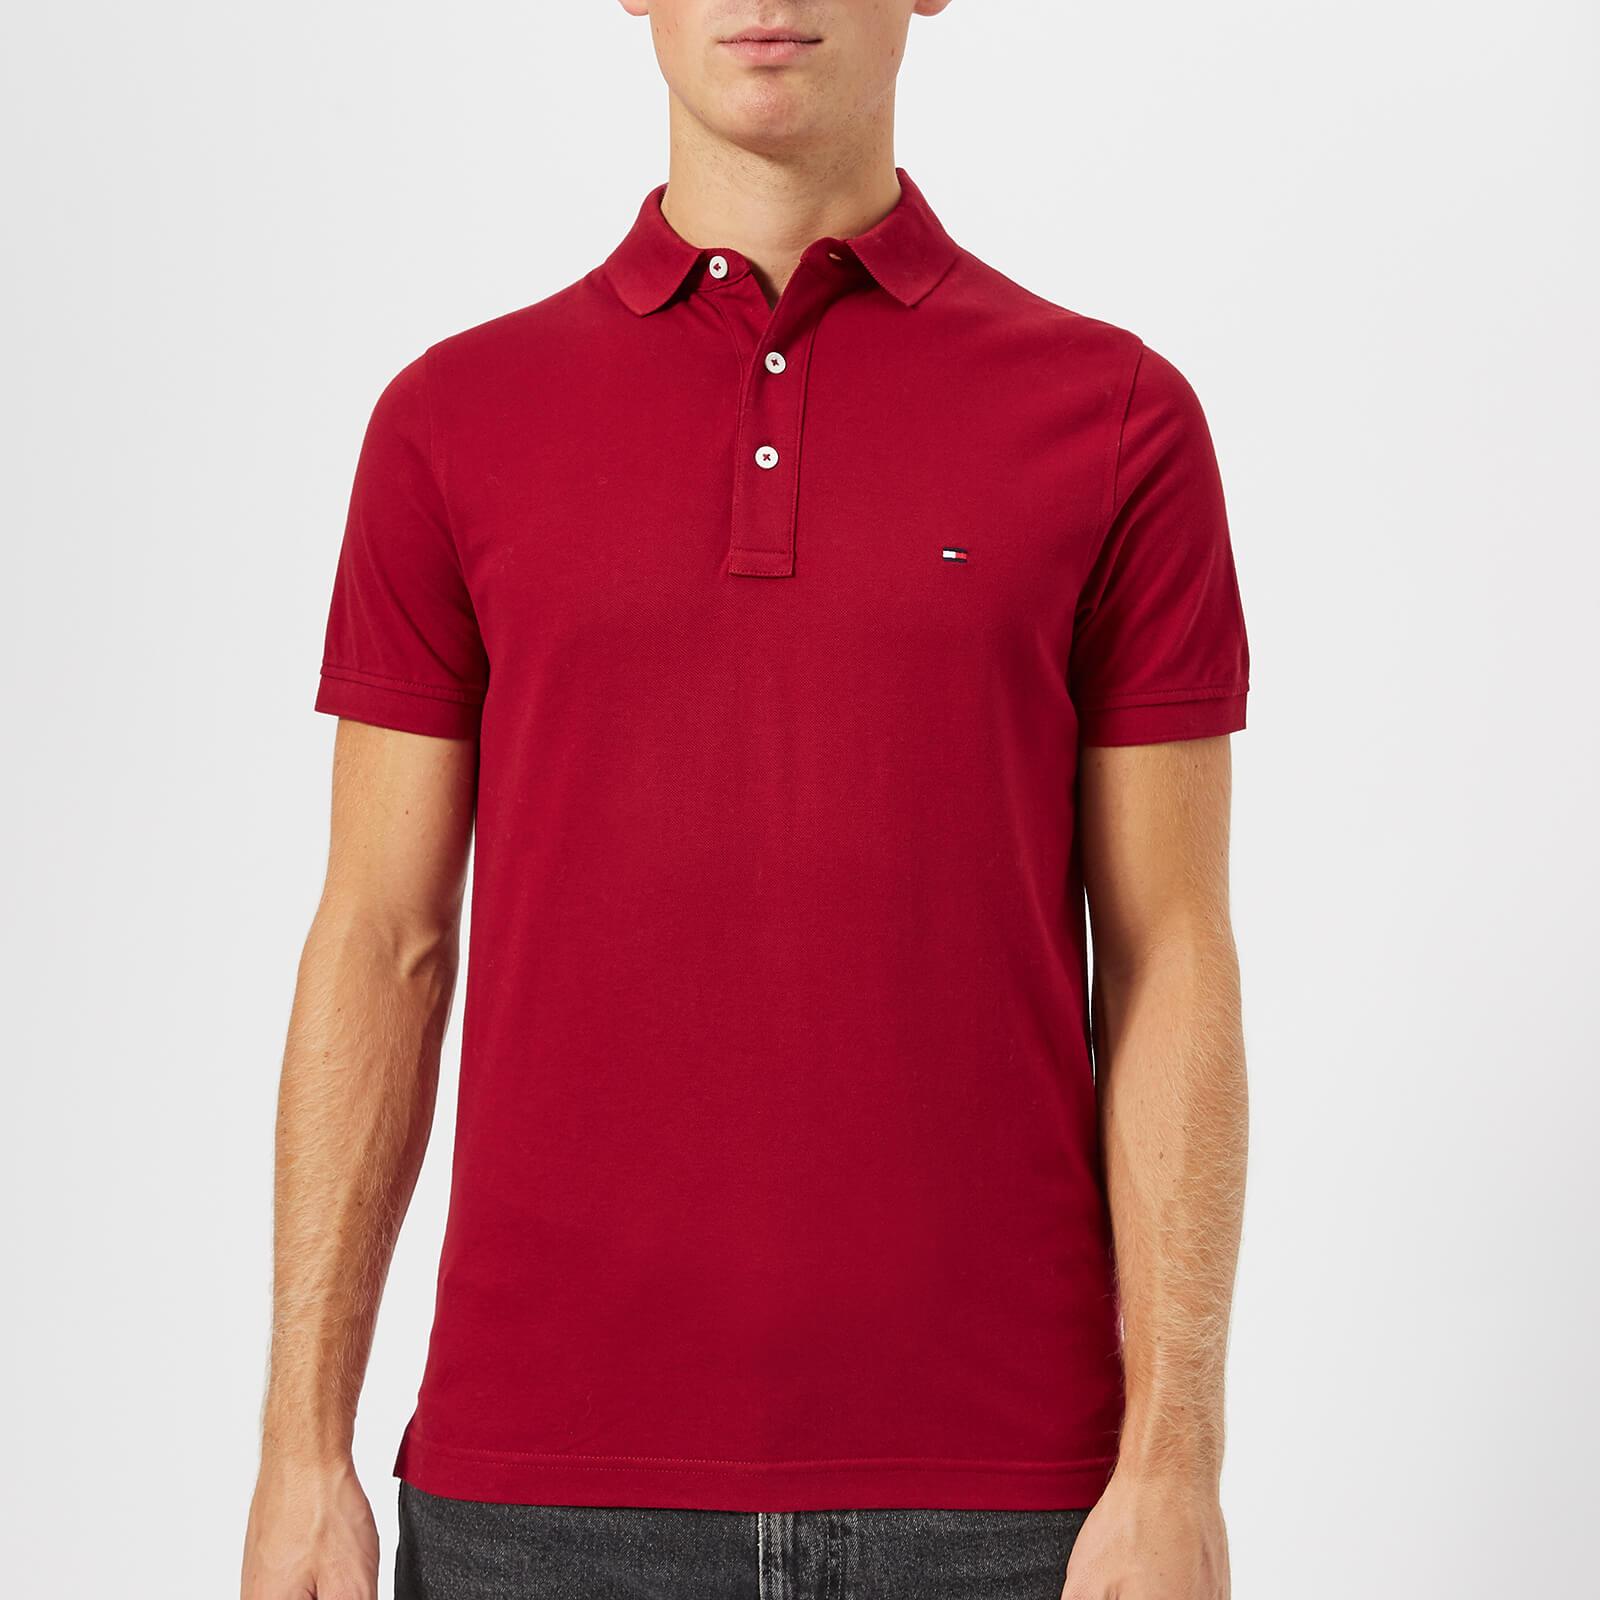 dbeb1619f Tommy Hilfiger Men's Tommy Slim Fit Polo Shirt - Rhubarb Clothing |  TheHut.com